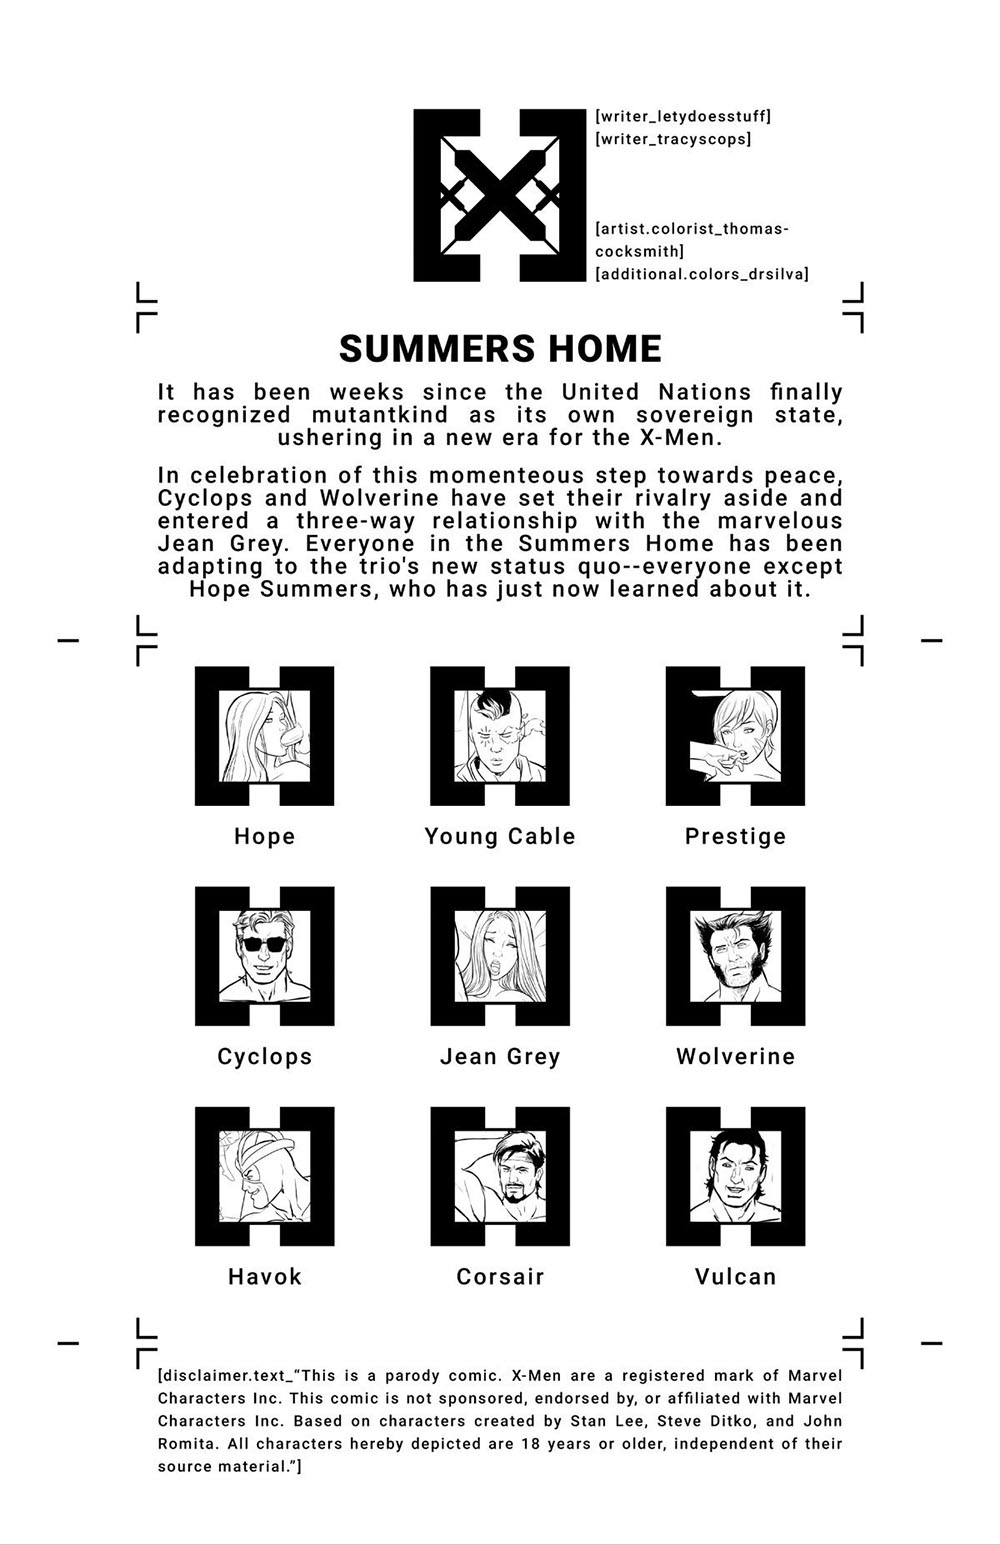 SUMMER Home House of XXX